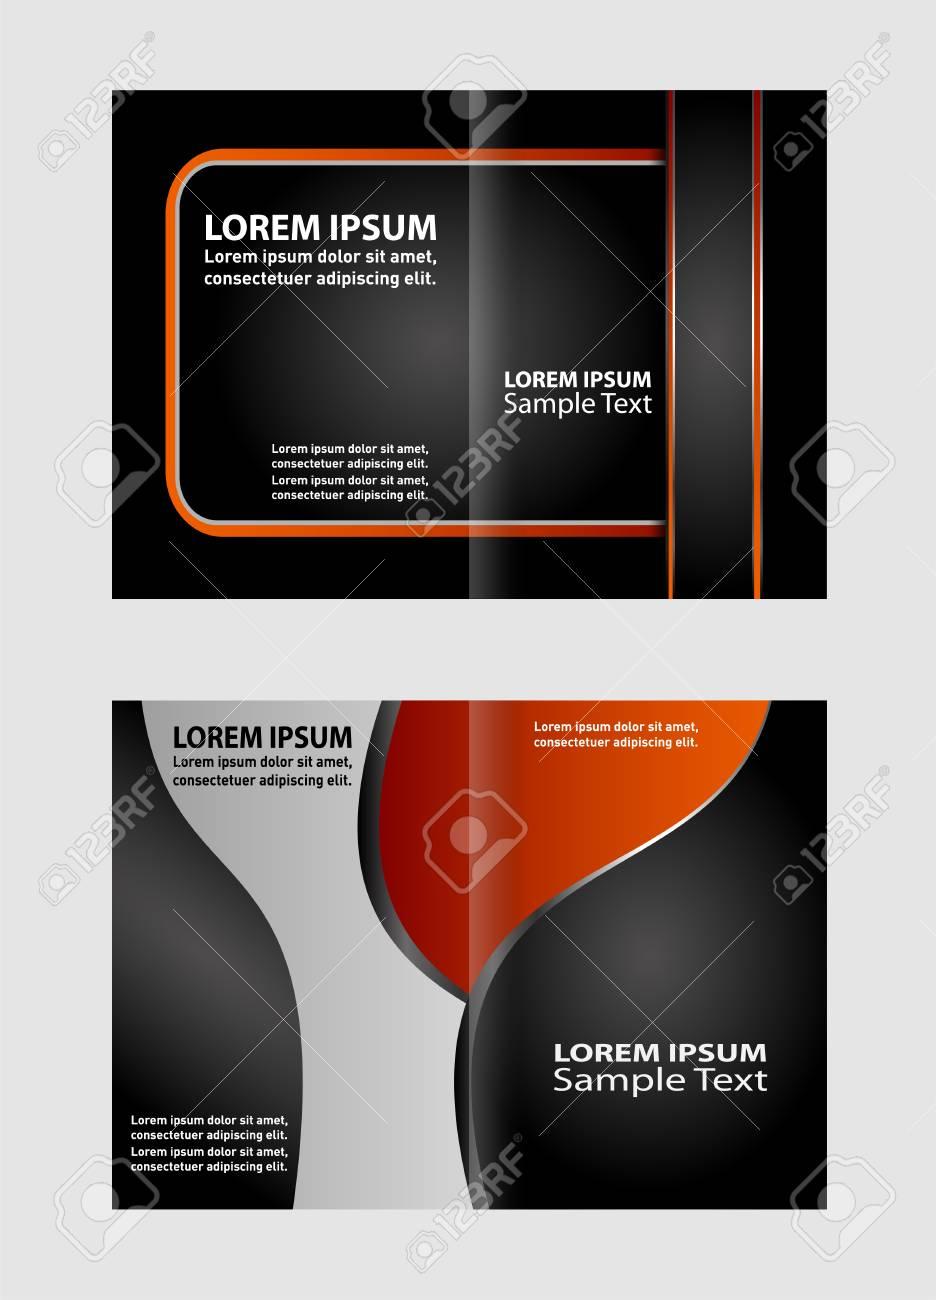 Bi Fold Brochure Design Templates Business Leaflet Booklet Royalty Free Cliparts Vectors And Stock Illustration Image 53840963